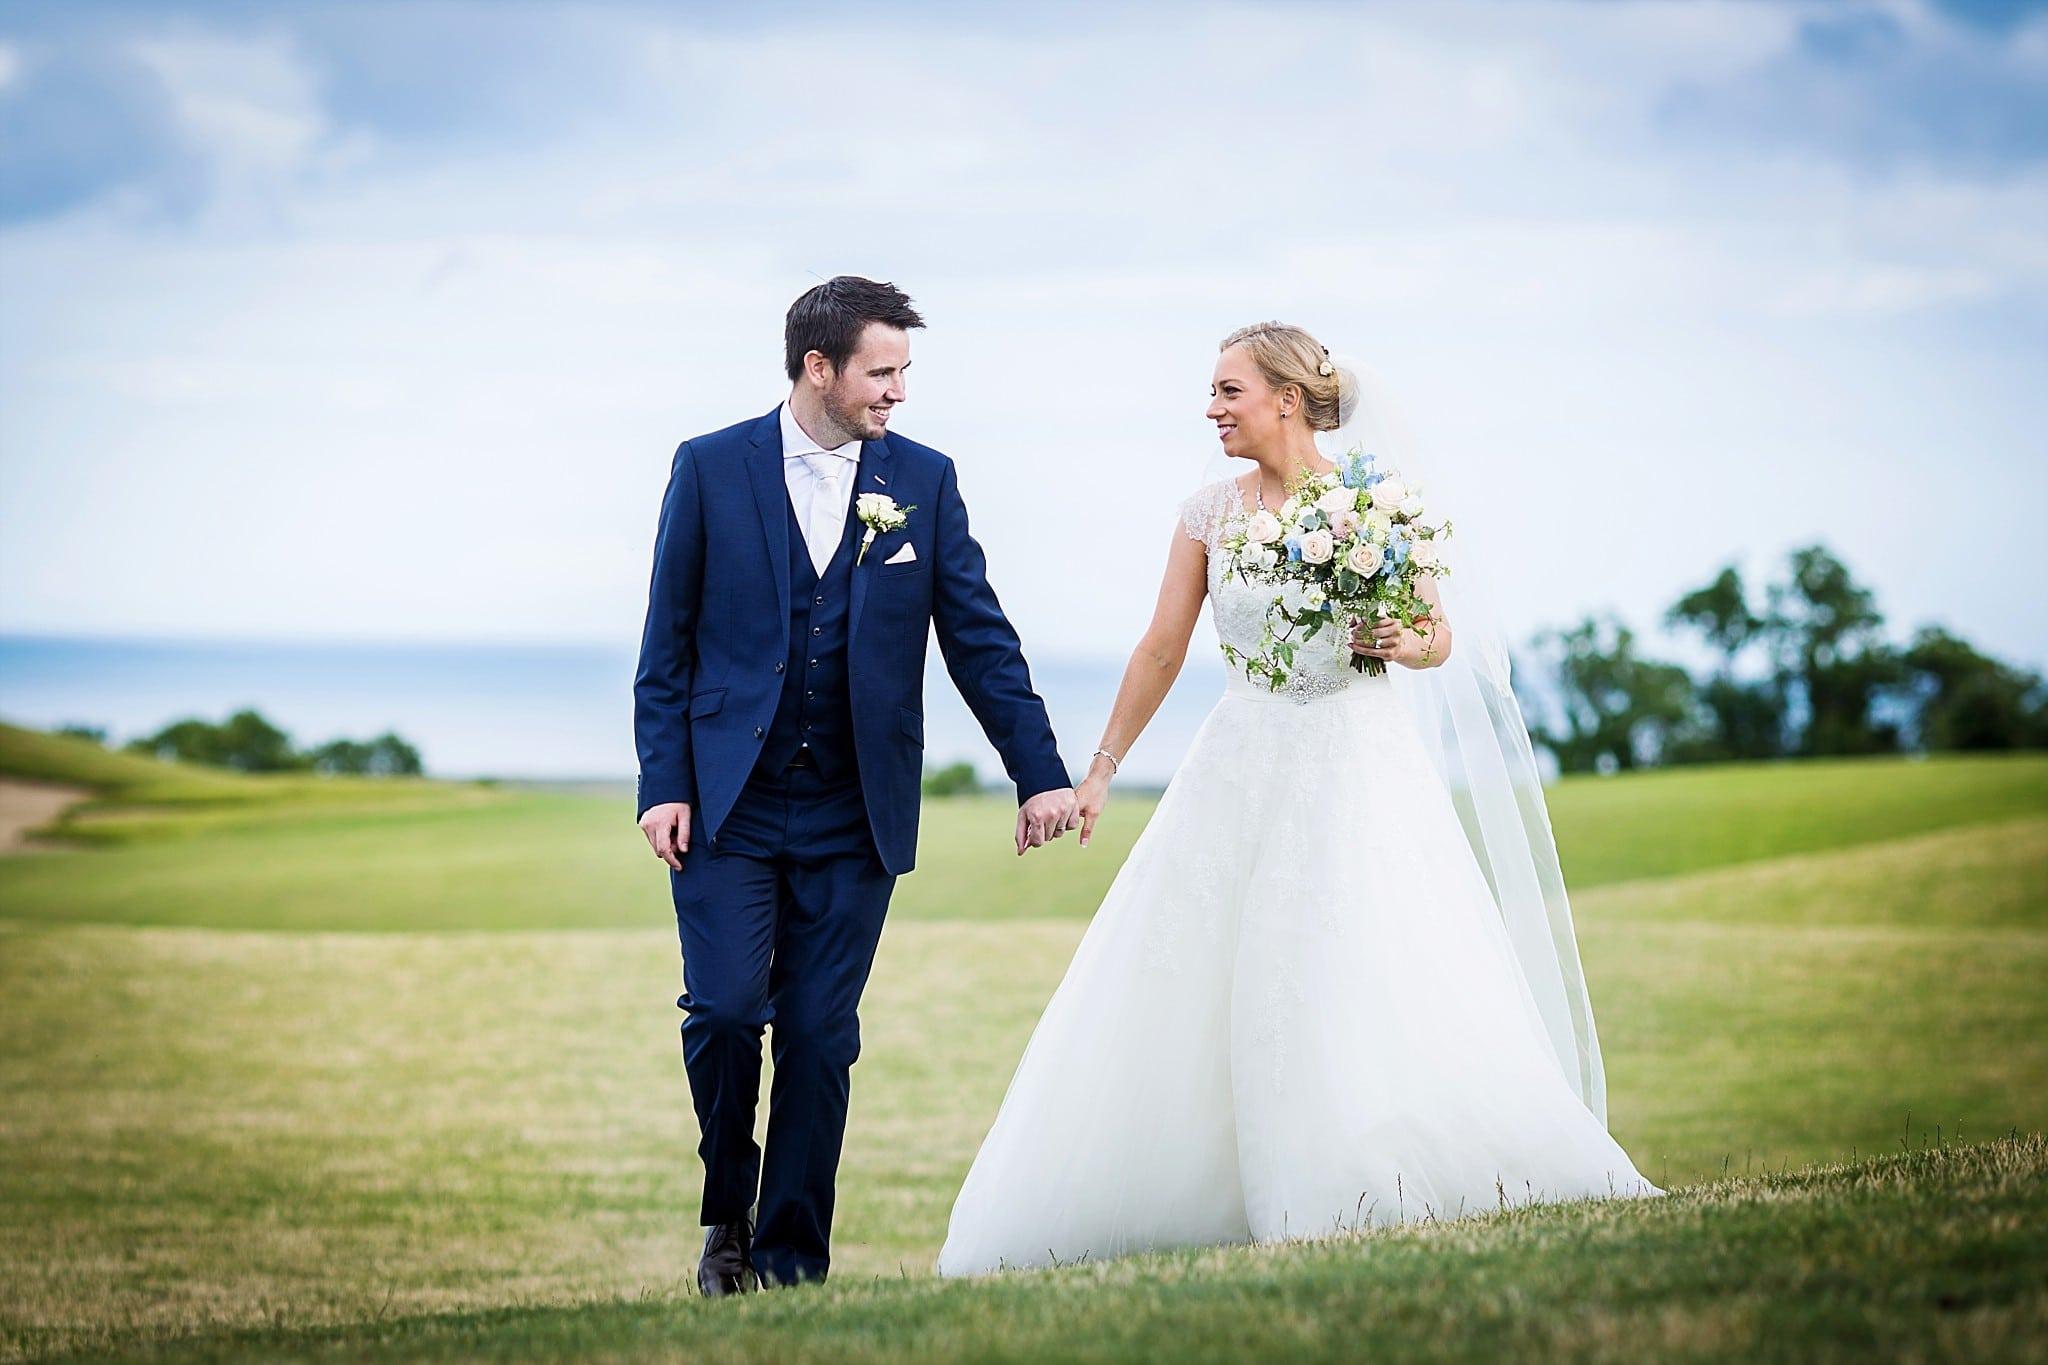 Wedding Photography at St Albans